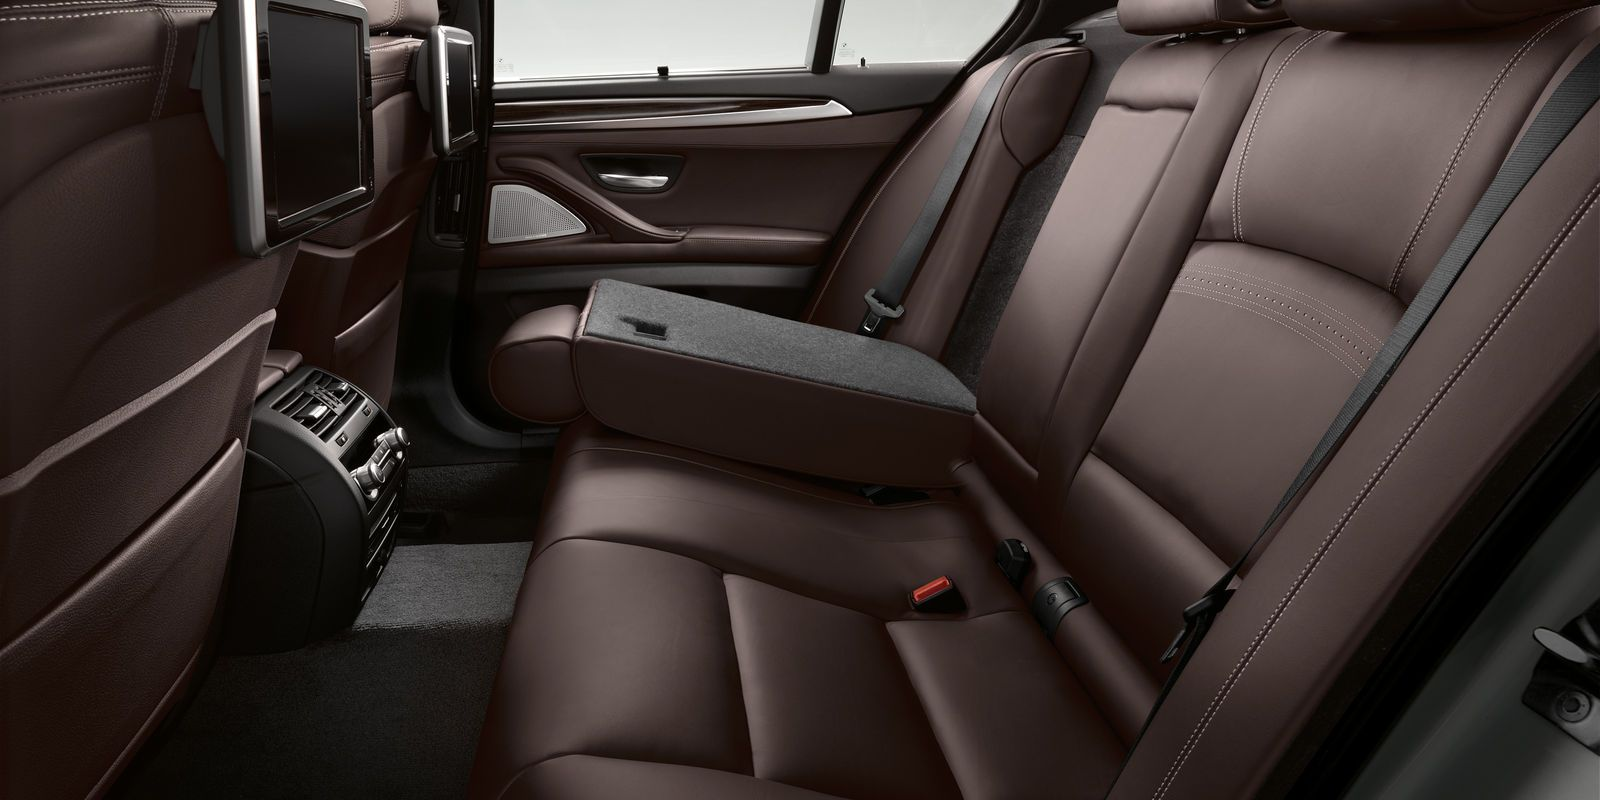 2015 Bmw 5 Series Interior Back Seat Bmw 5 Series Bmw New Bmw